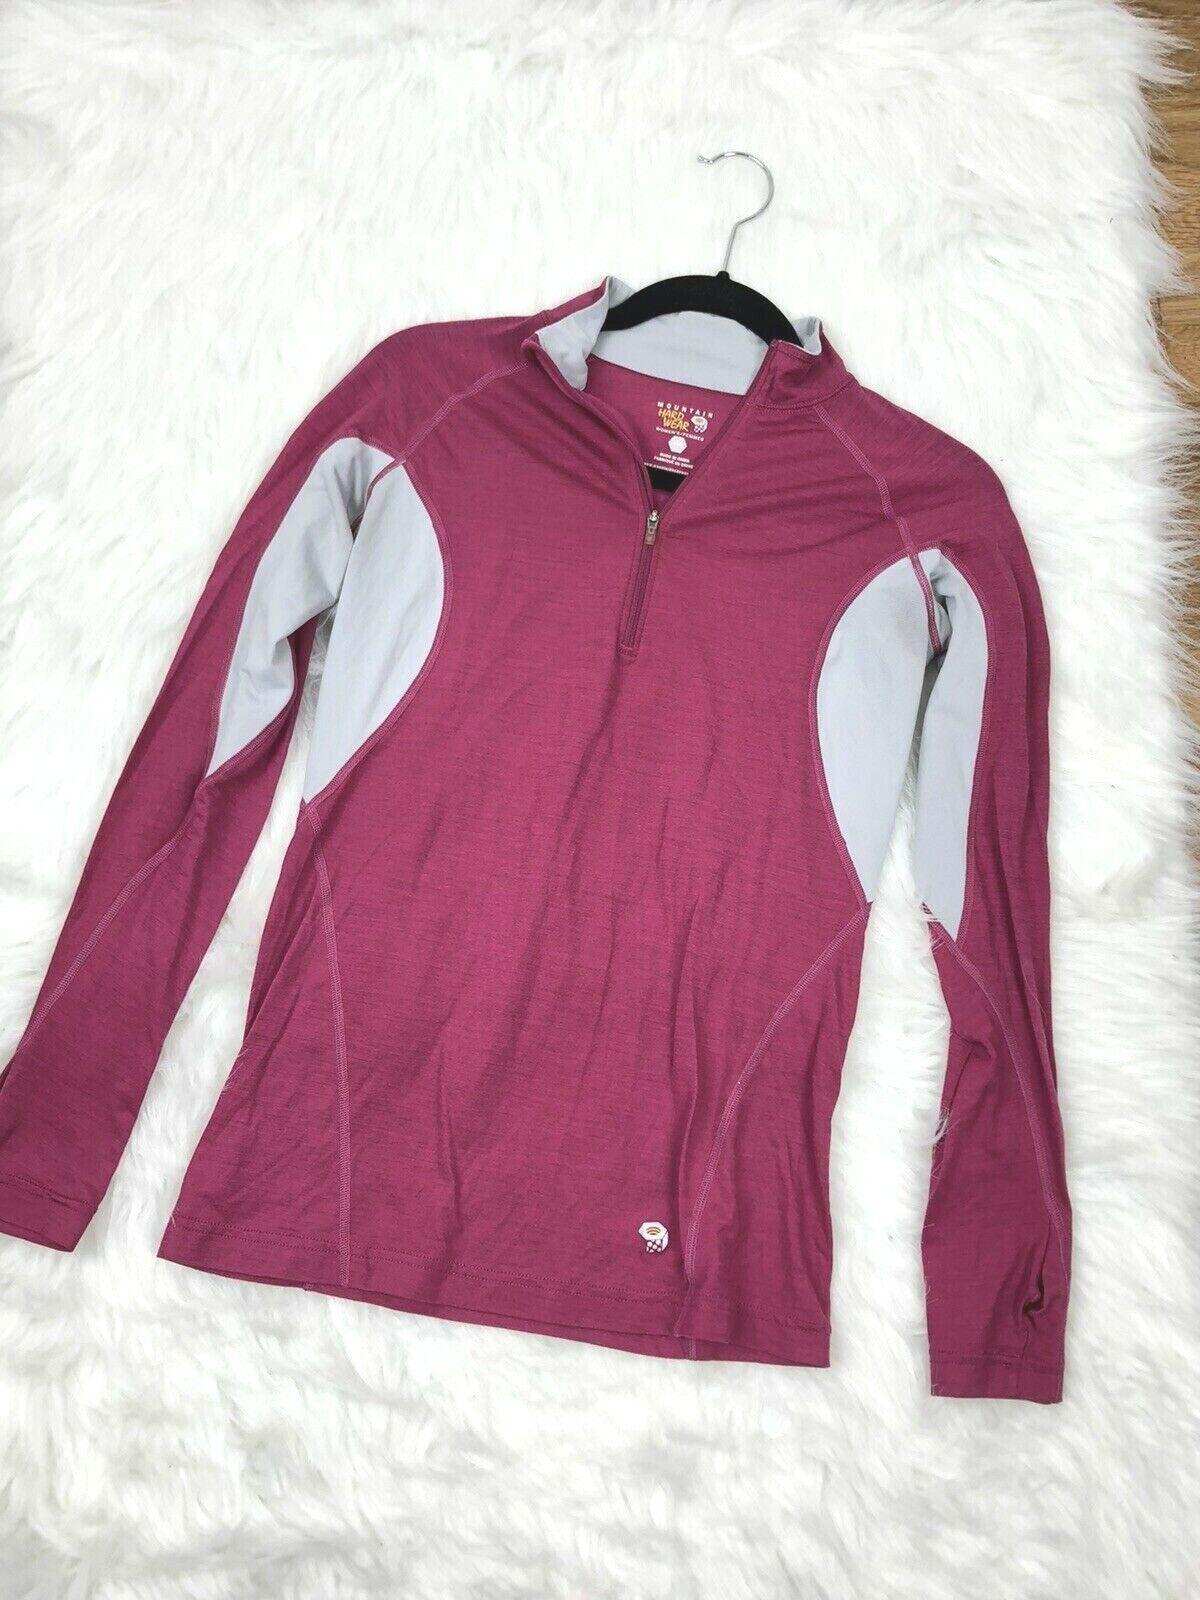 Mountain Hardwear Womens Pullover 1/4 Zip Long Sleeve Top Sm Pink Gray Light